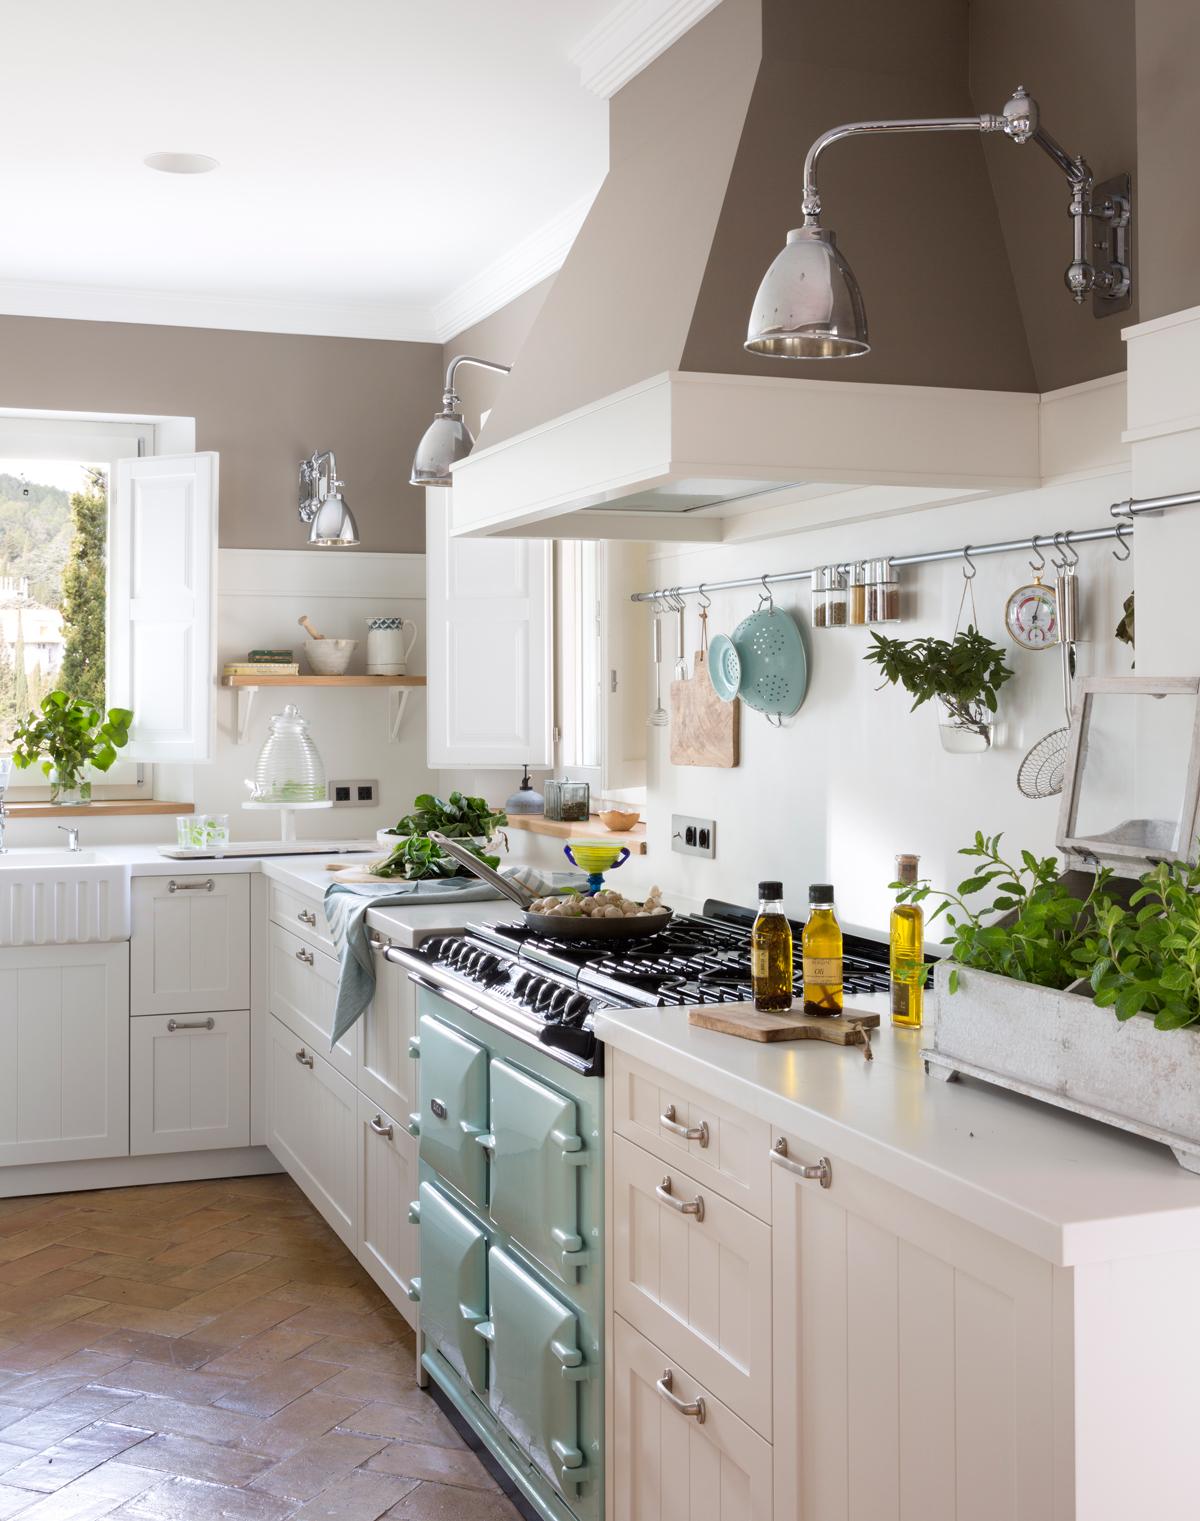 Dale color a tu cocina blanca - Pintura para baldosas de cocina ...